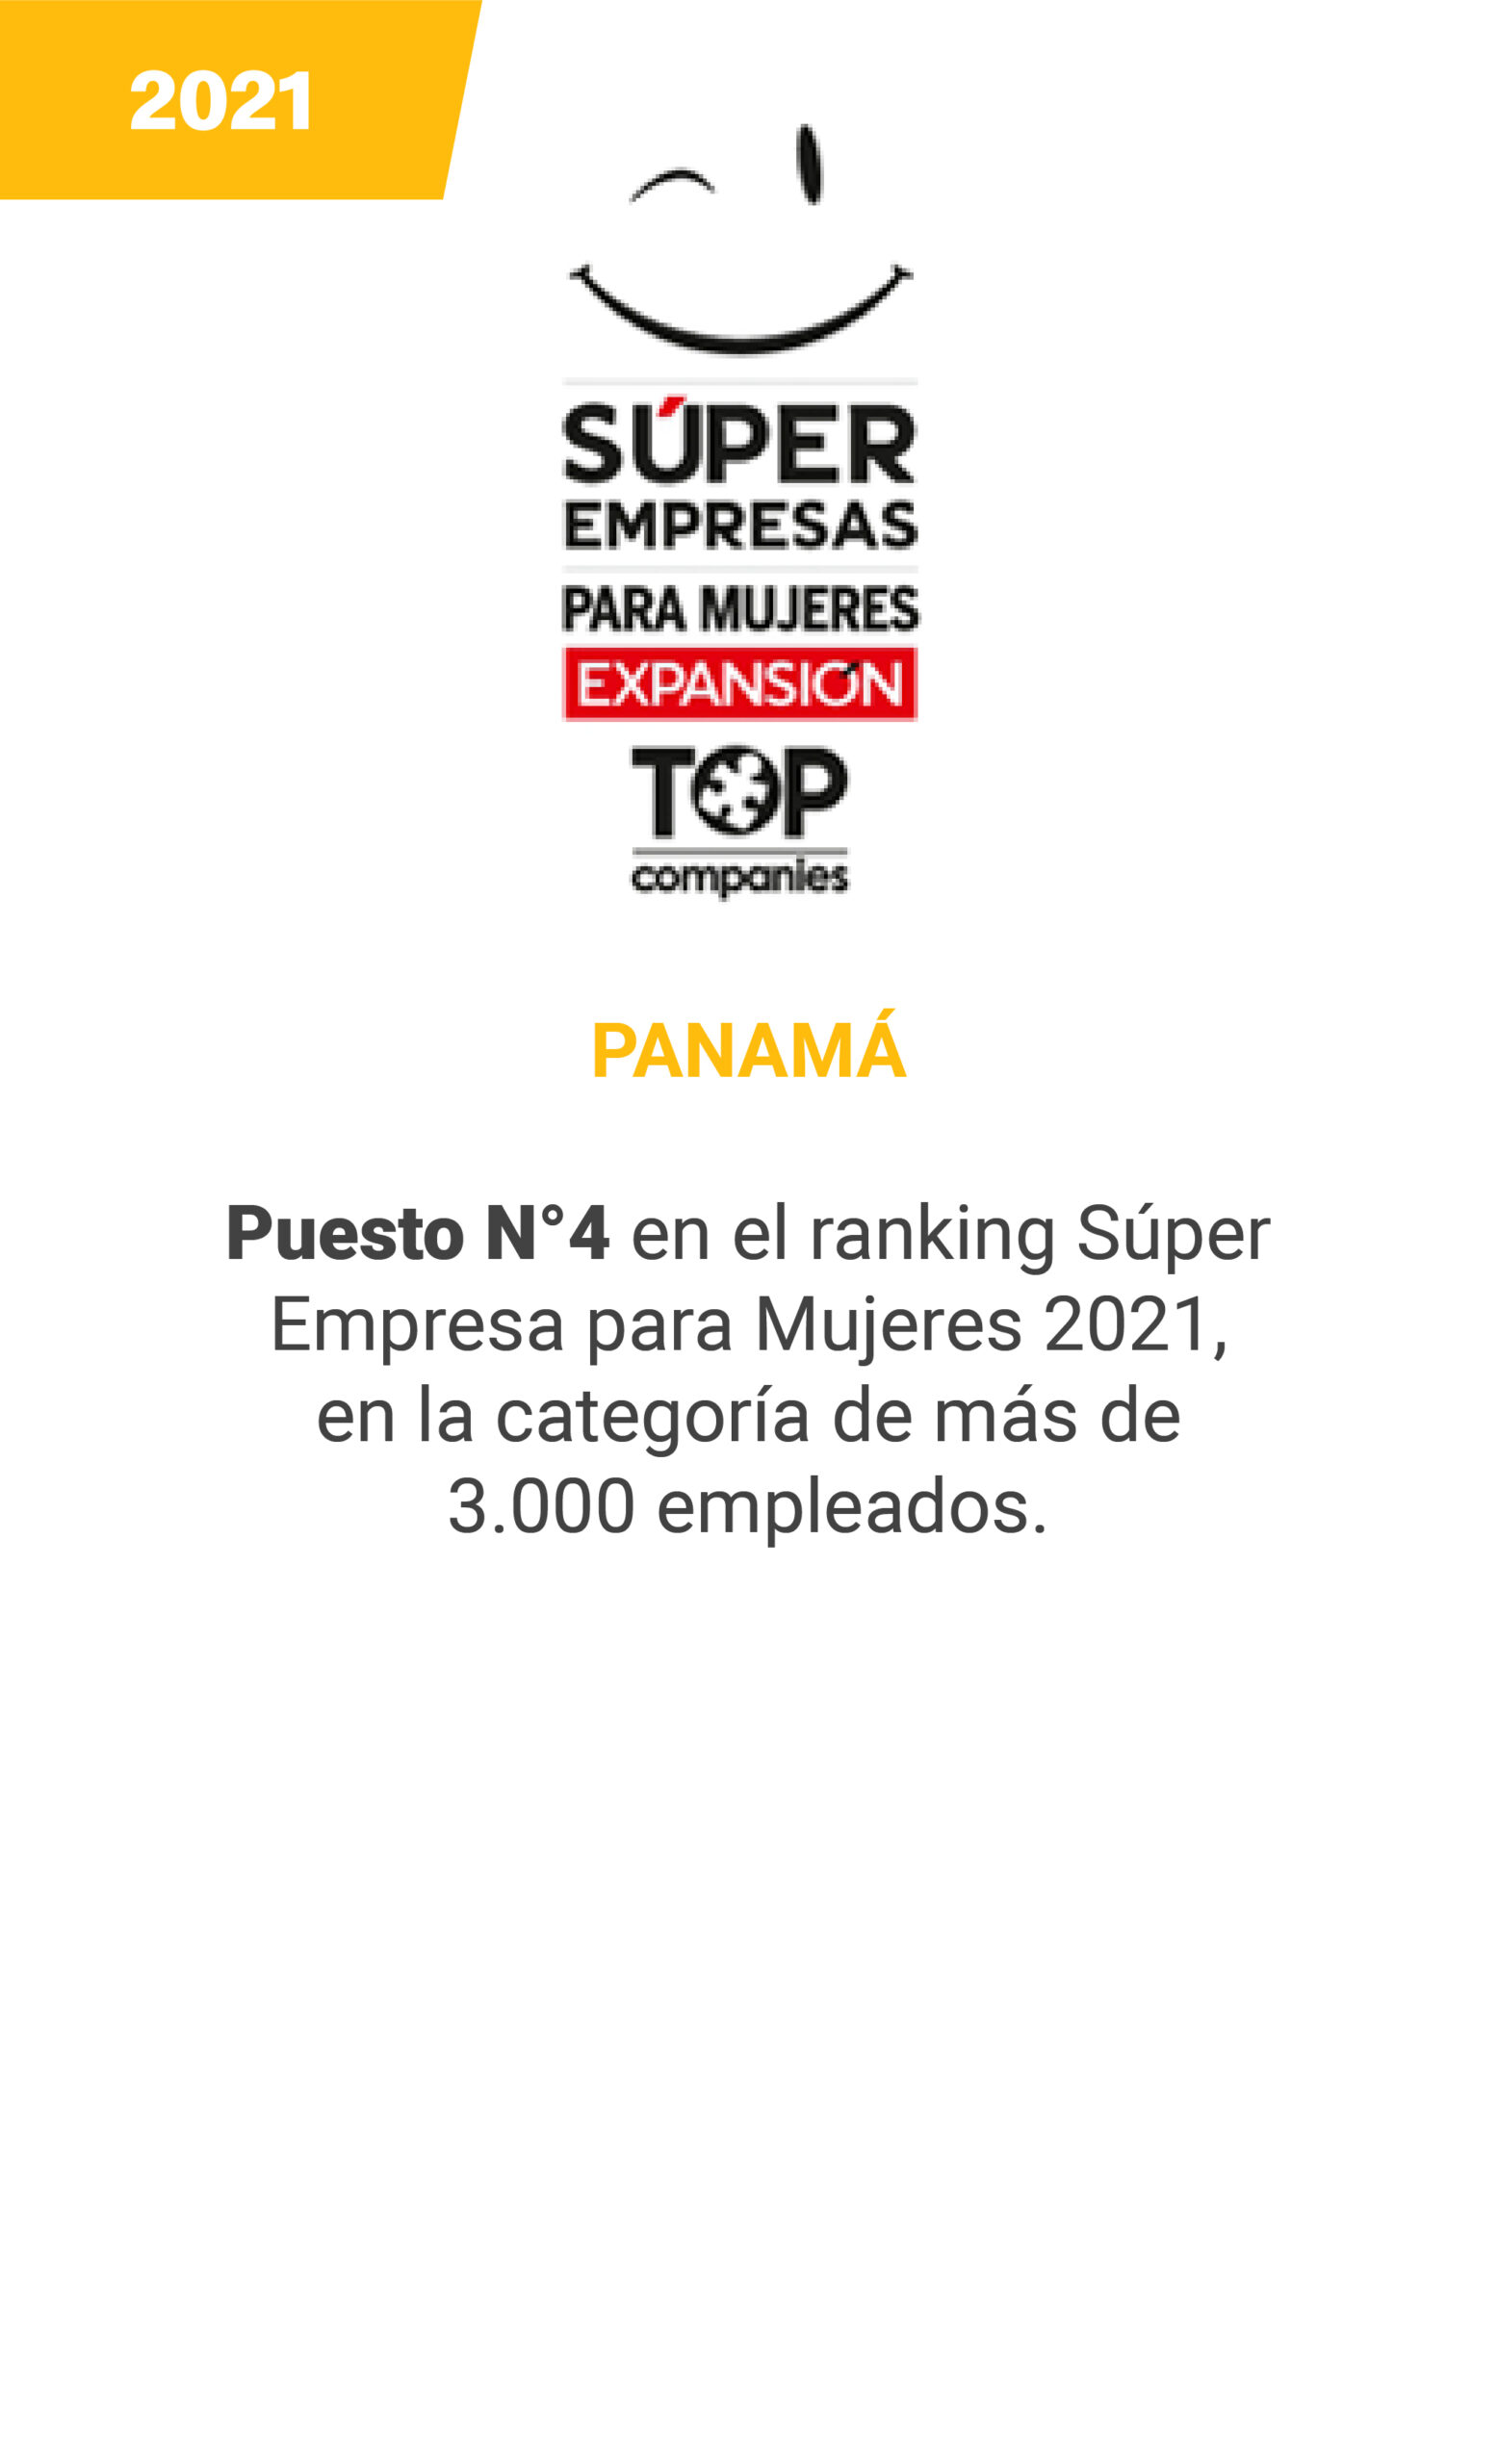 Super Empresas 2021 Mujeres - mobile